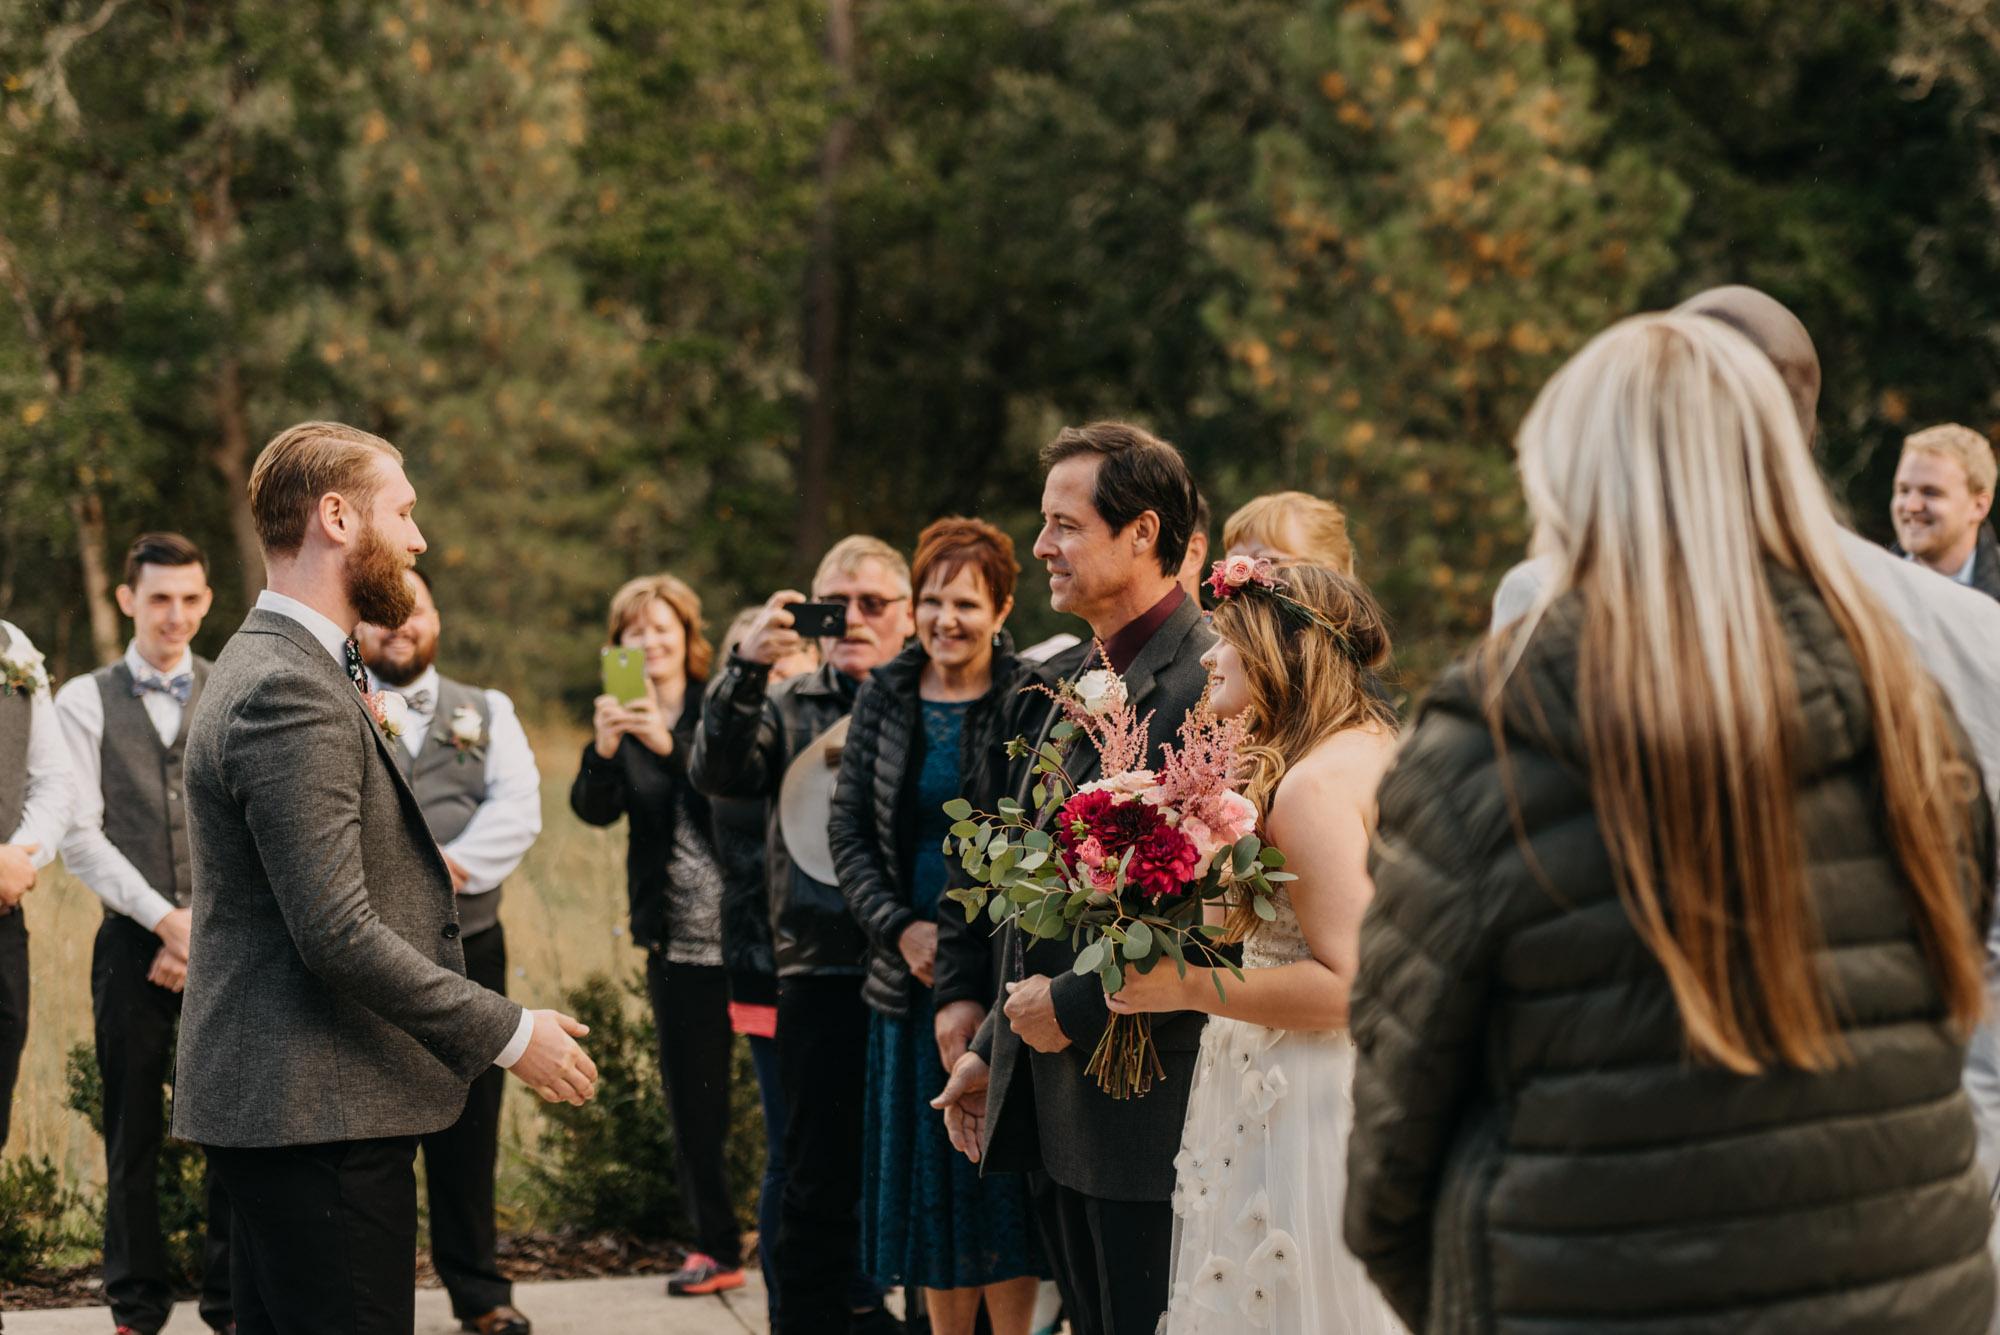 Outdoor-Summer-Ceremony-Washington-Wedding-Rainbow-8938.jpg